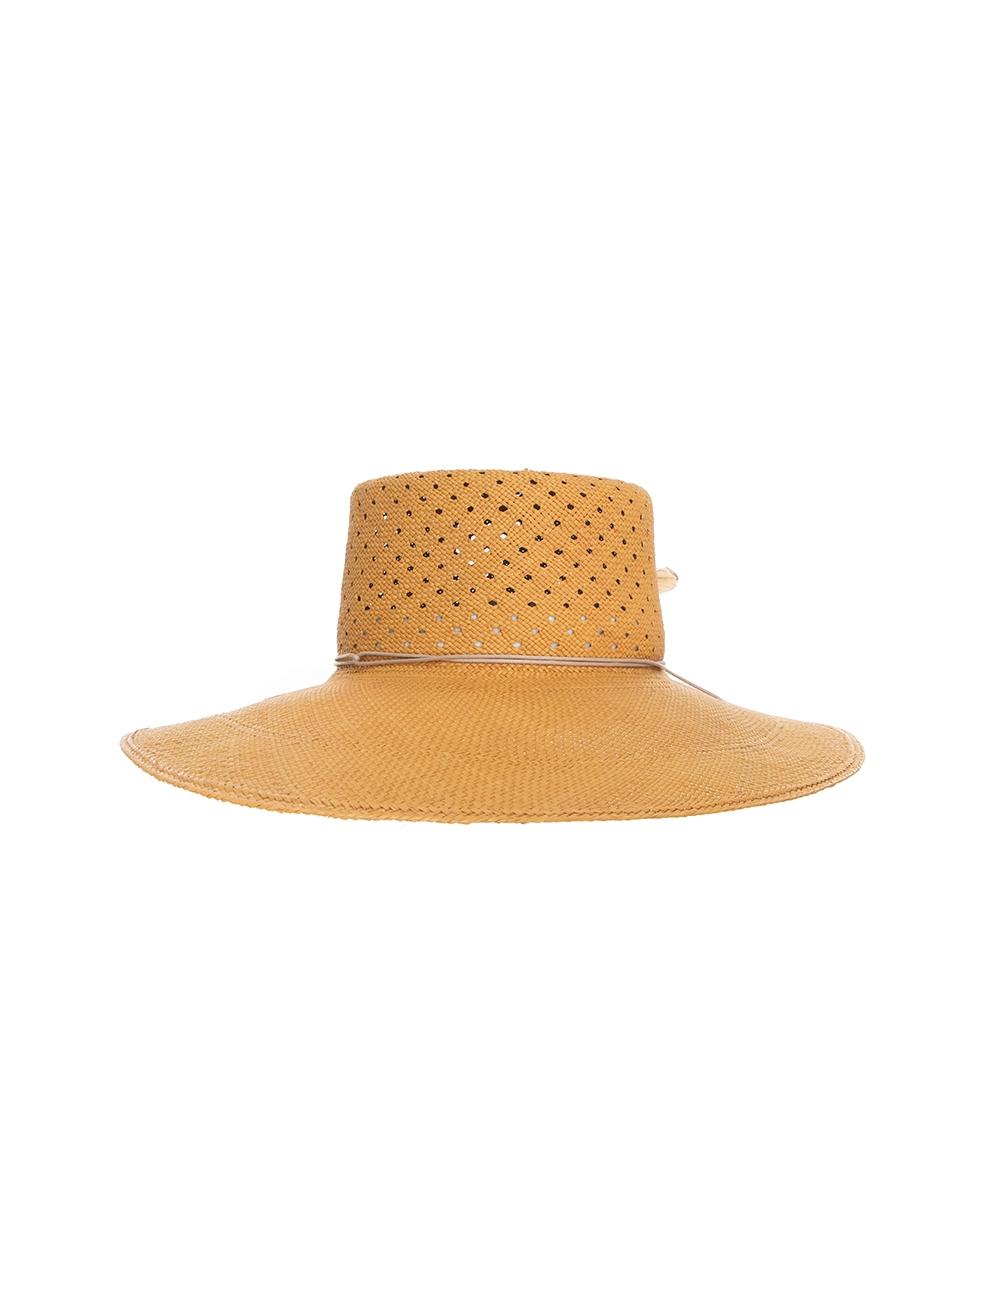 Vent Crown Panama Hat